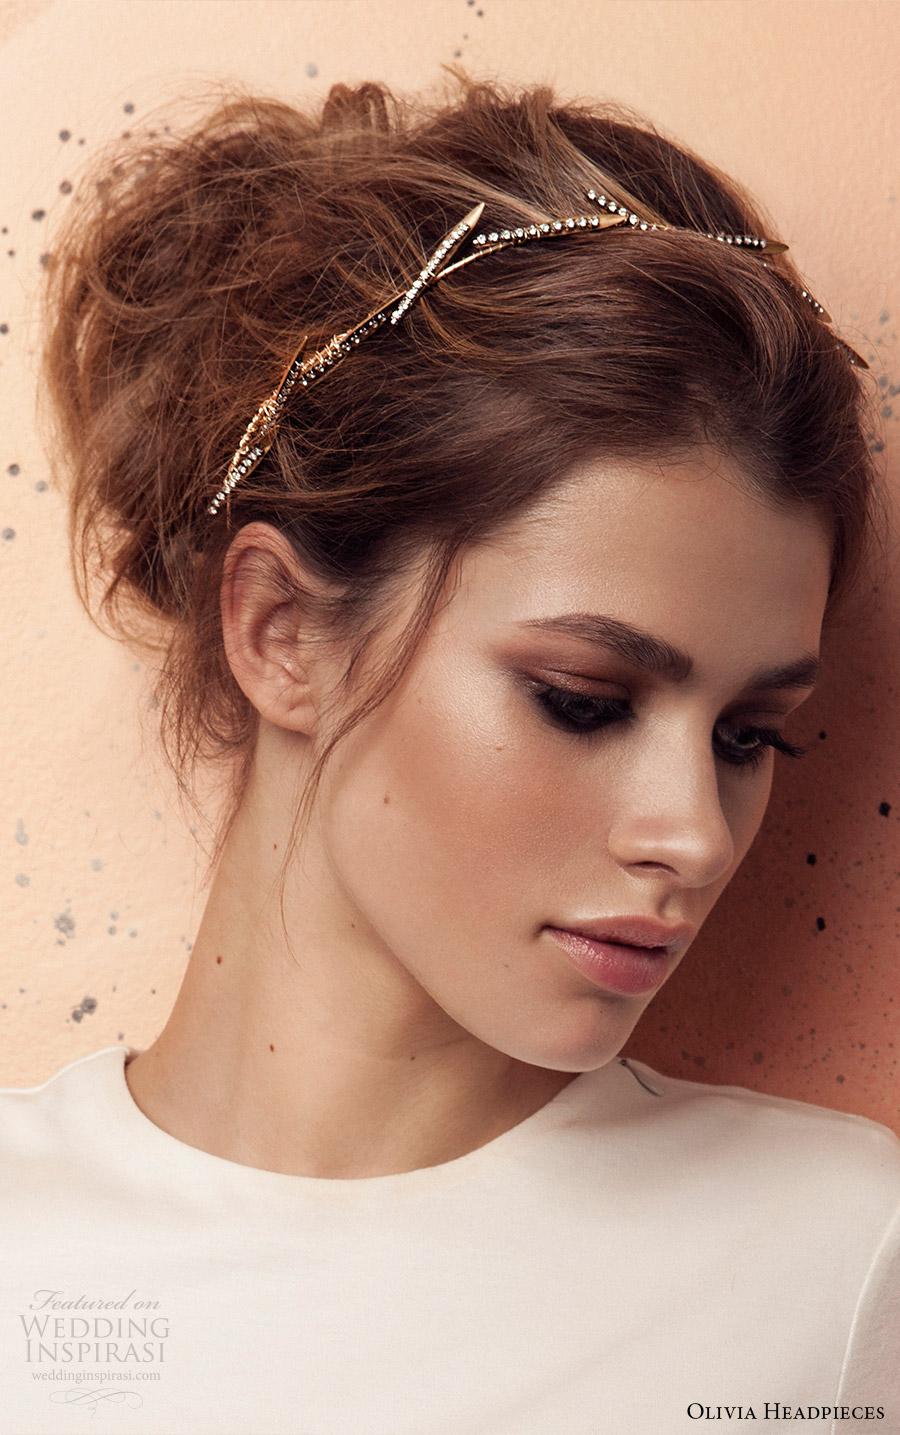 olivia headpieces 2017 bridal accessories bardot headband